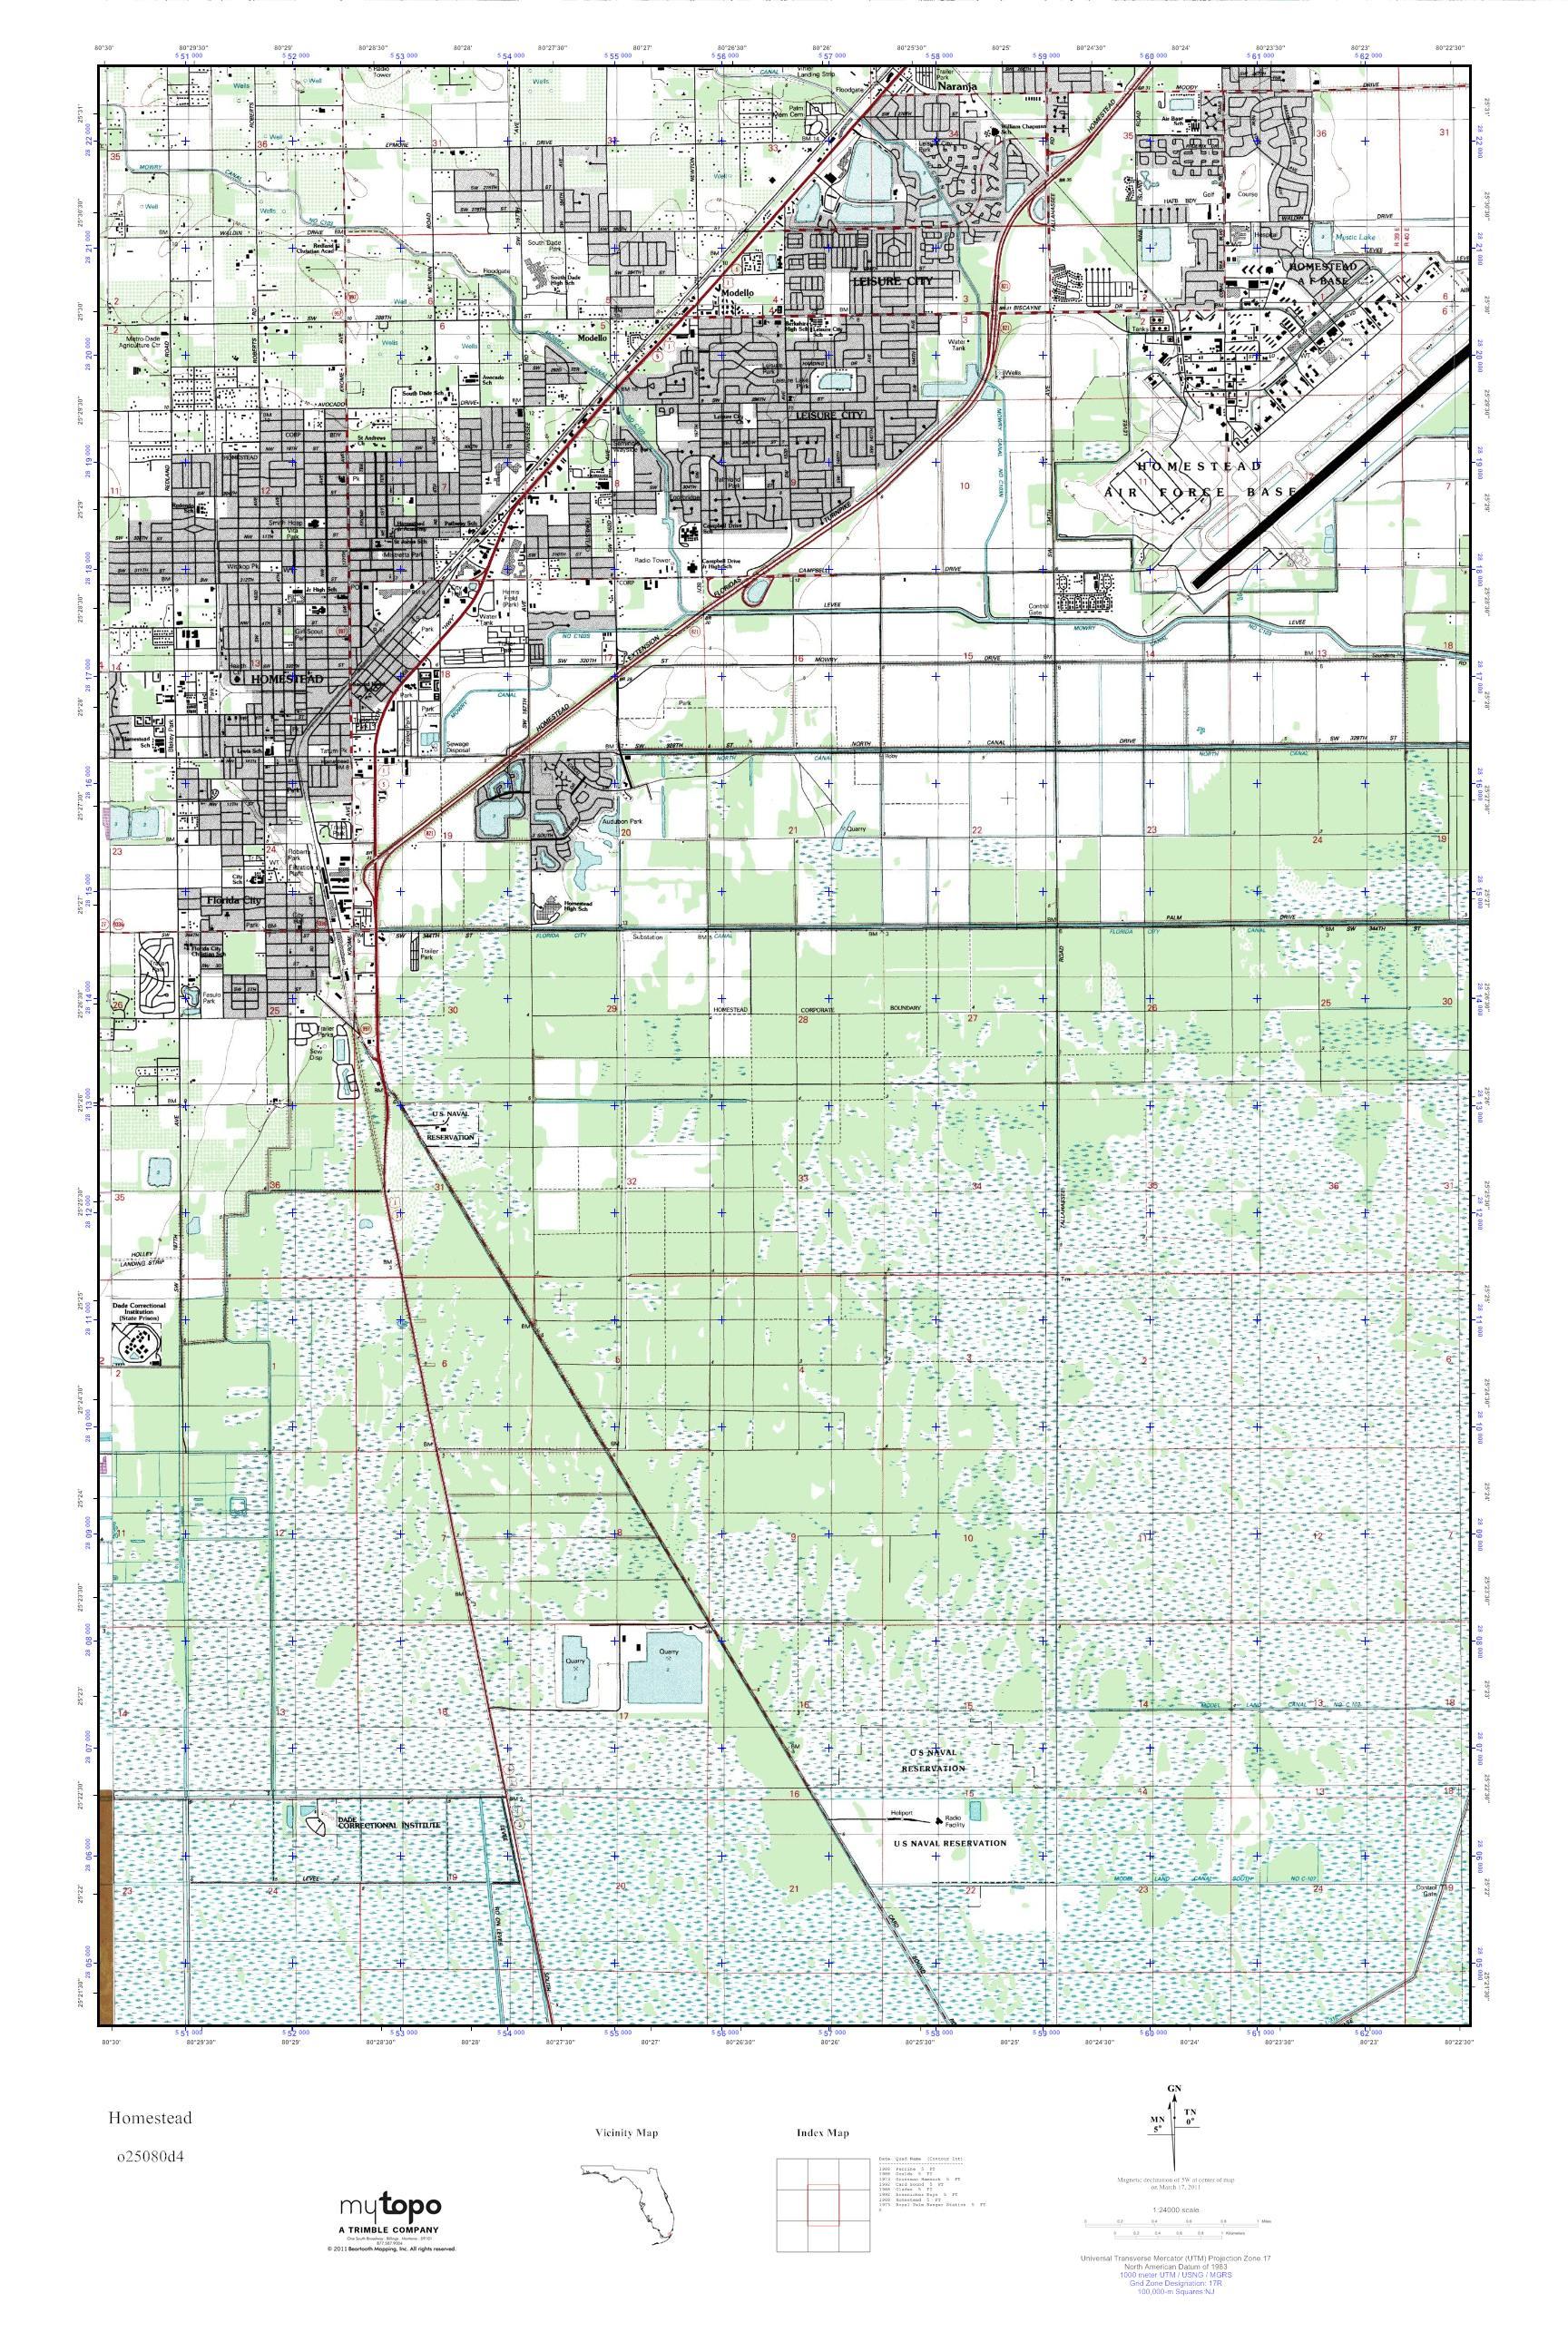 Map Of Homestead Florida.Mytopo Homestead Florida Usgs Quad Topo Map